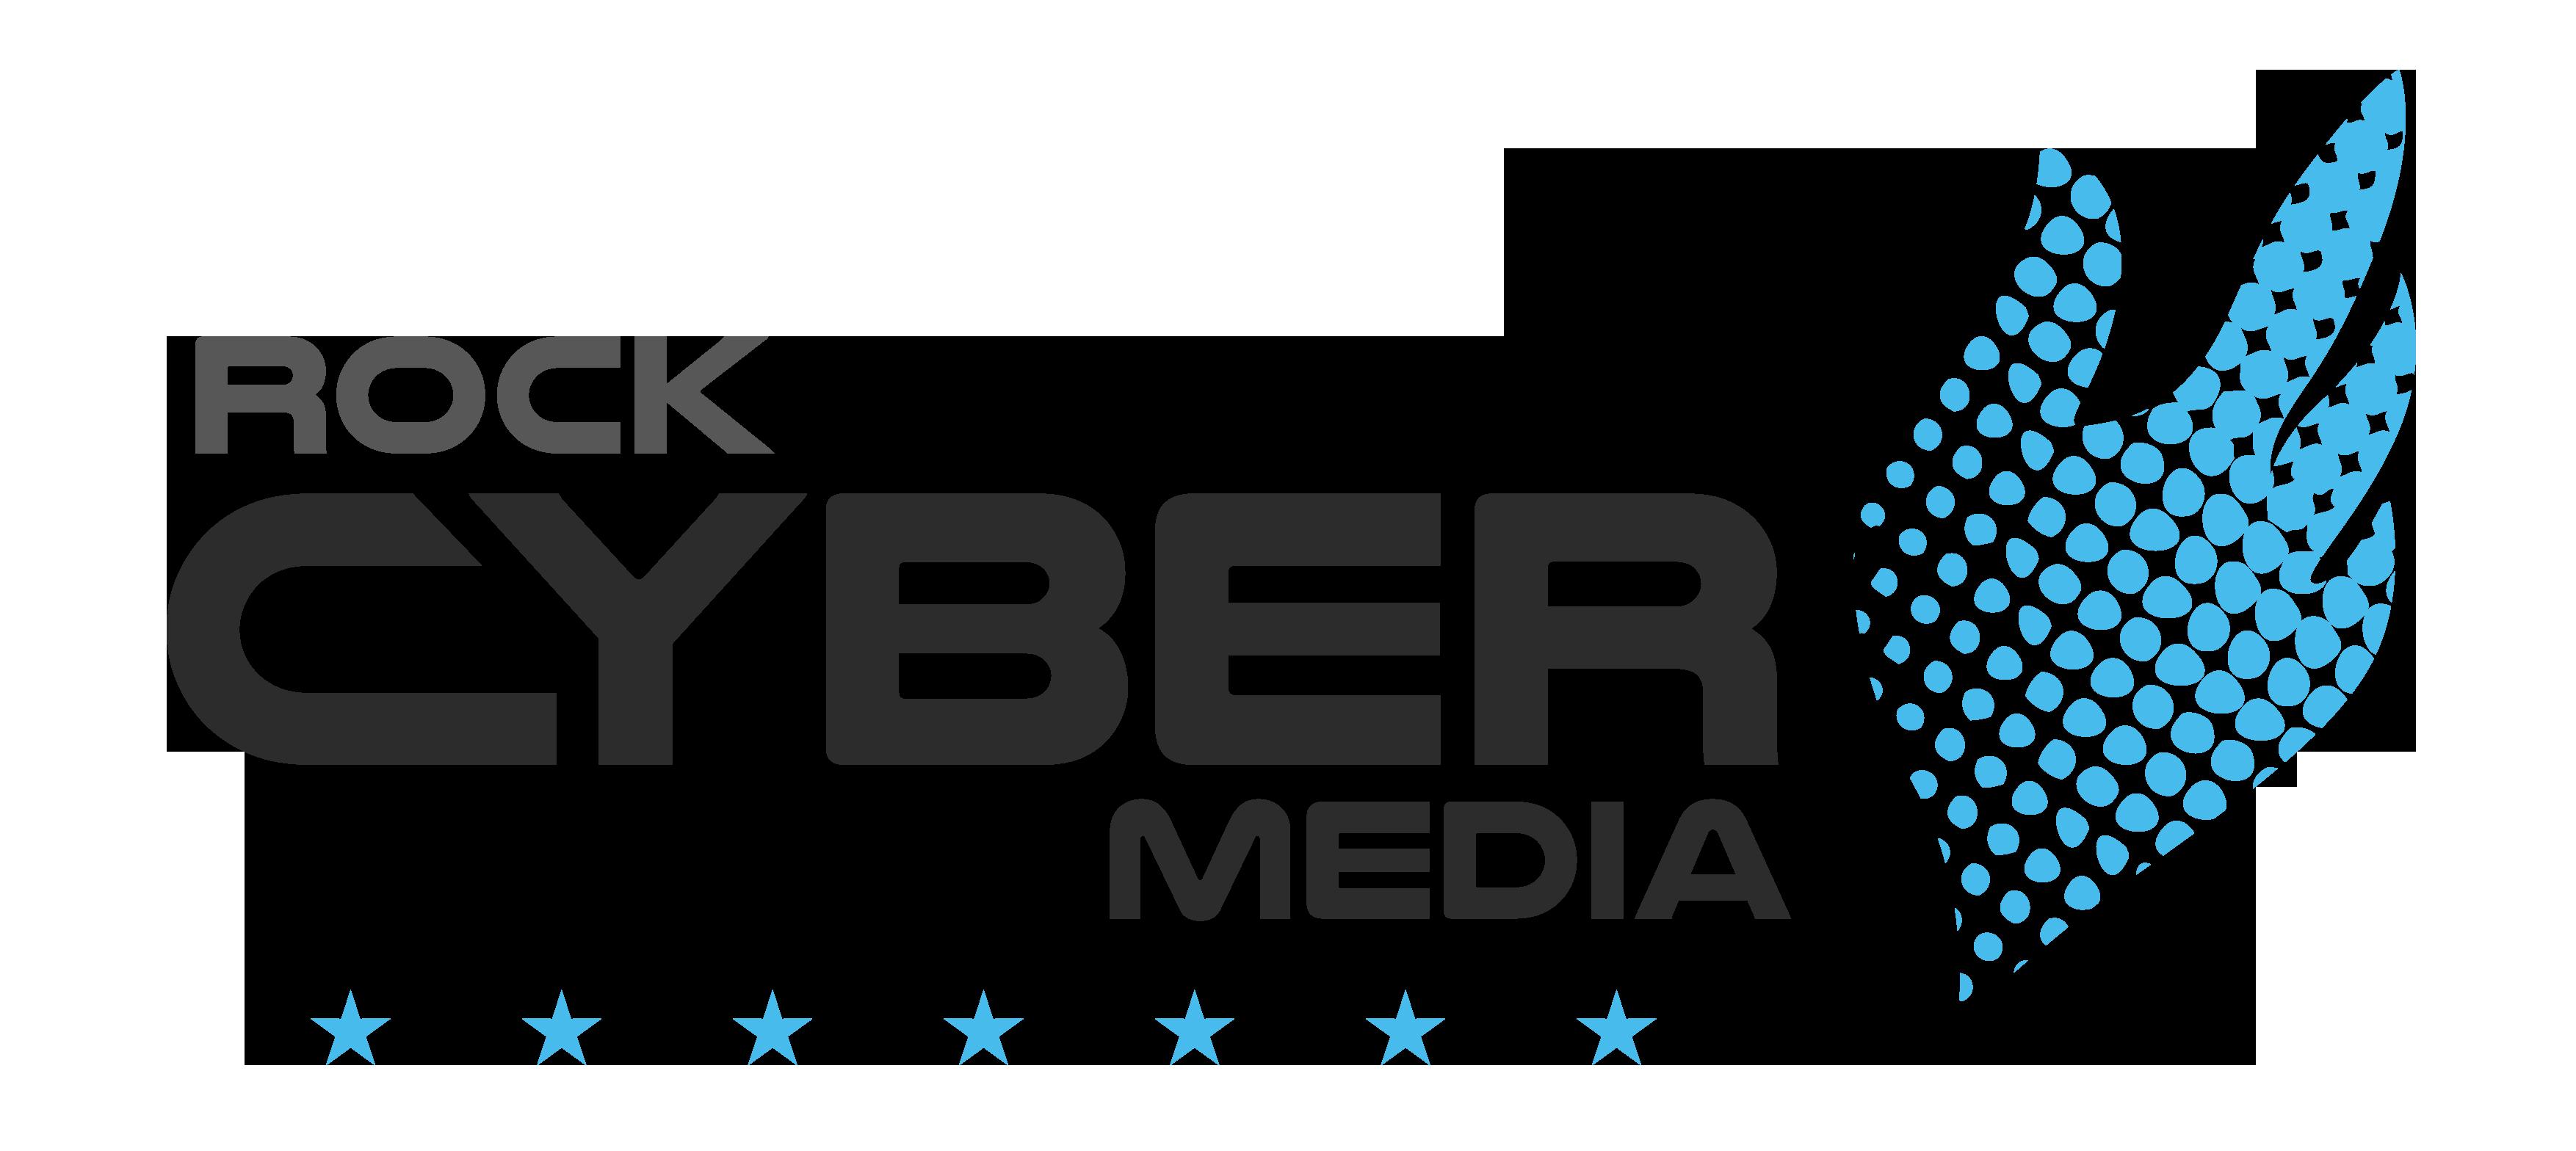 Cyber Media Academy